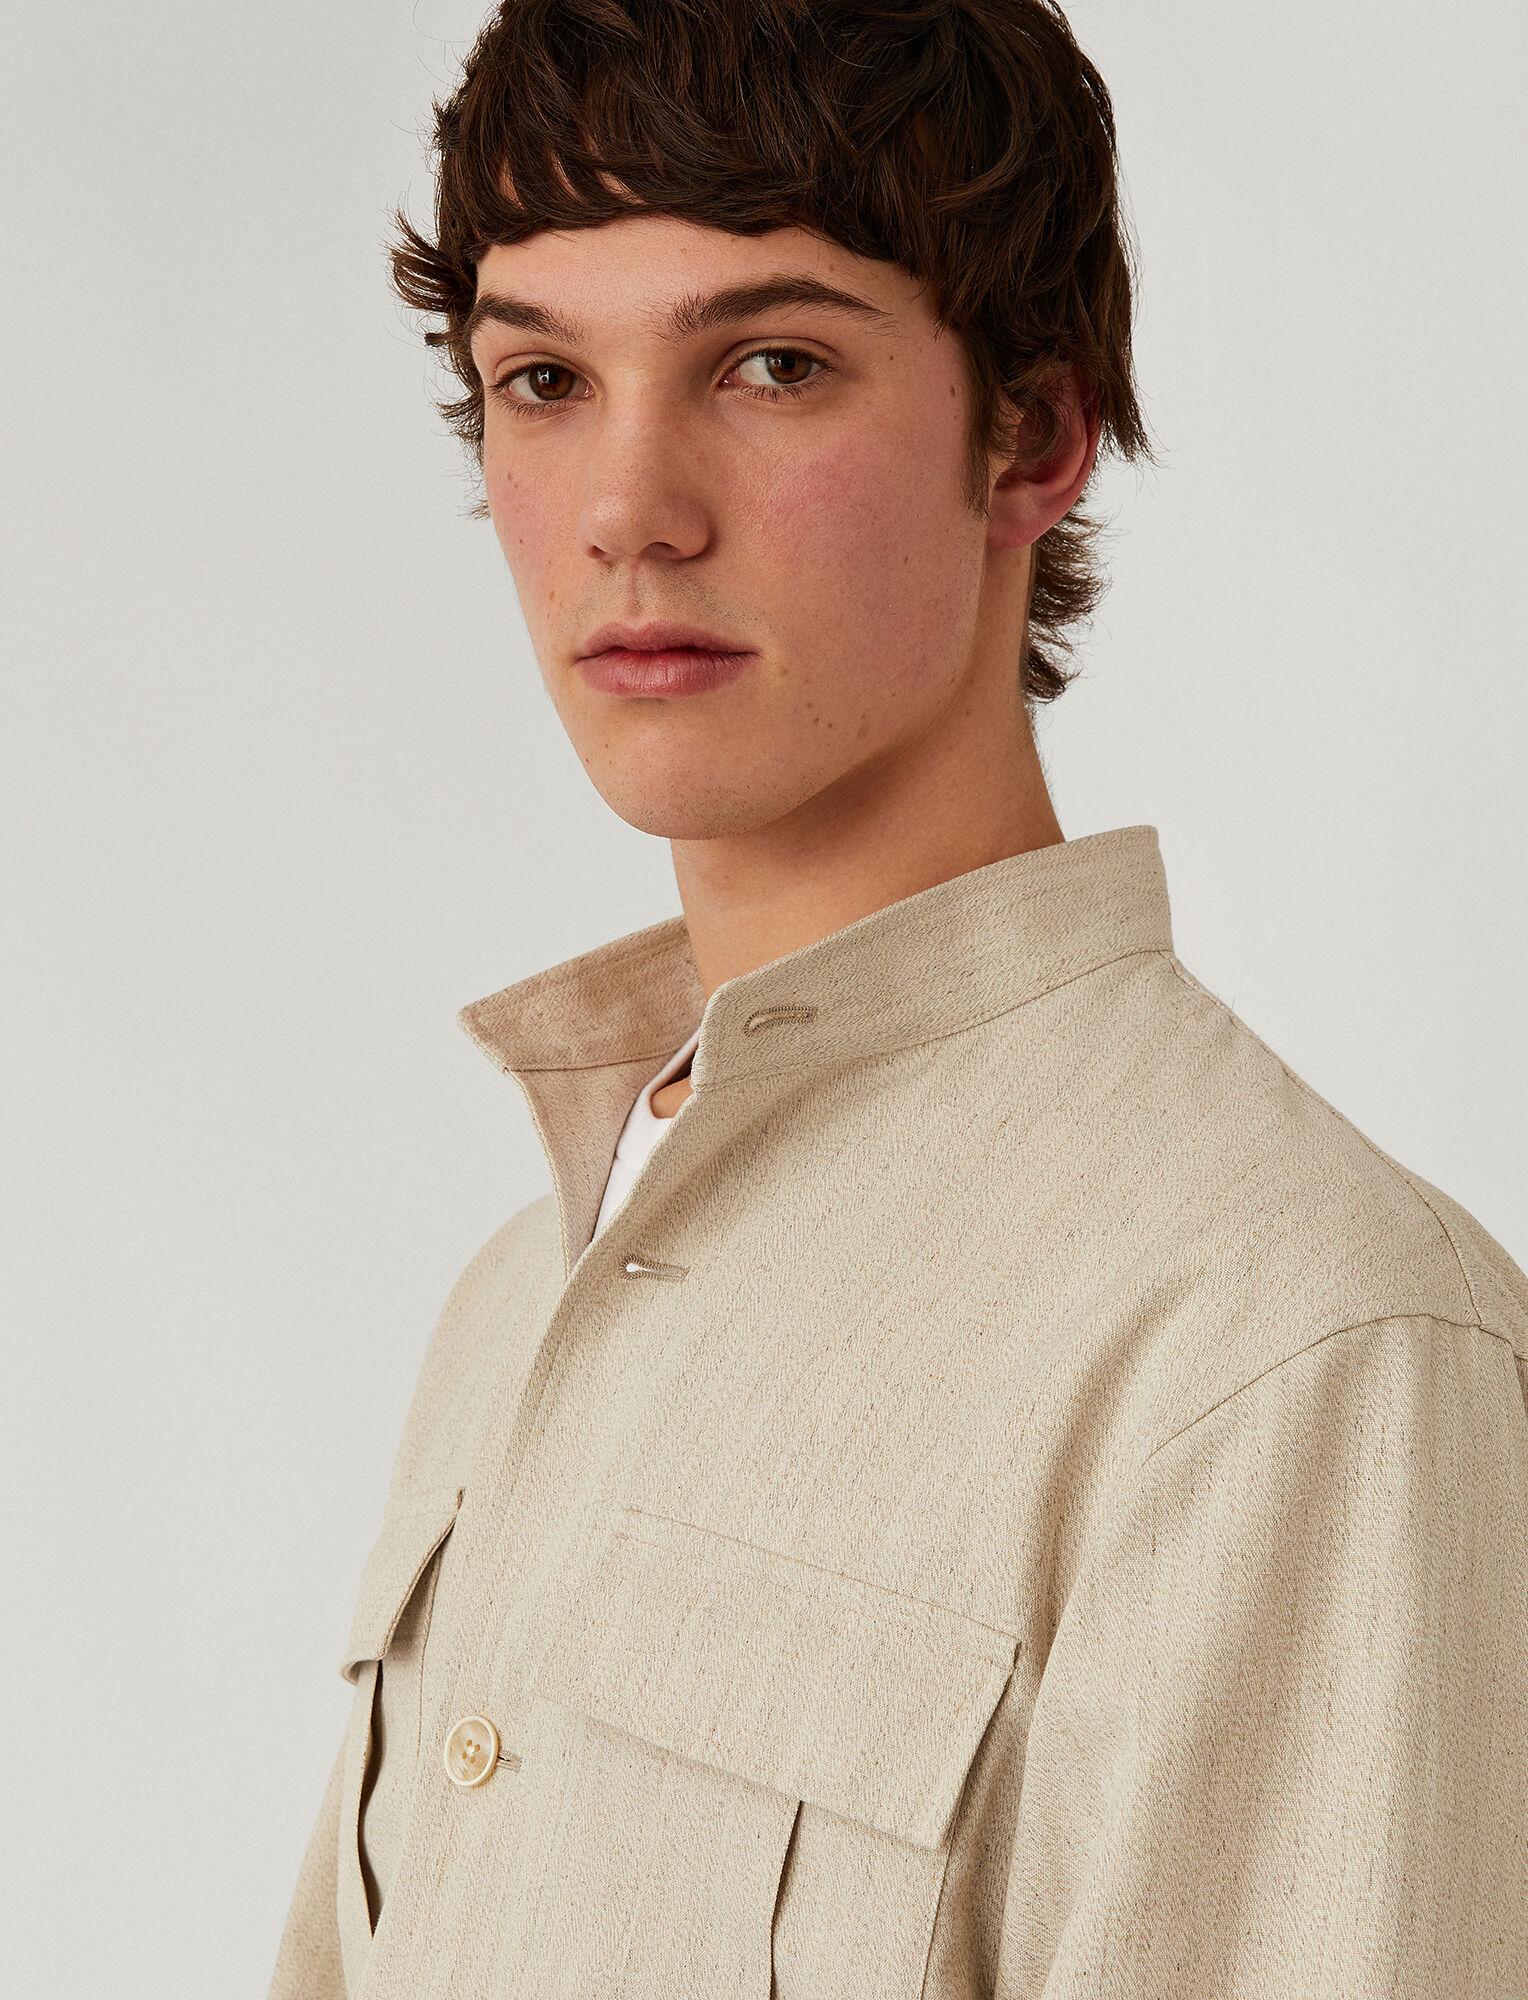 Joseph, Murine Hemp Twill Jacket, in LIGHT GREY